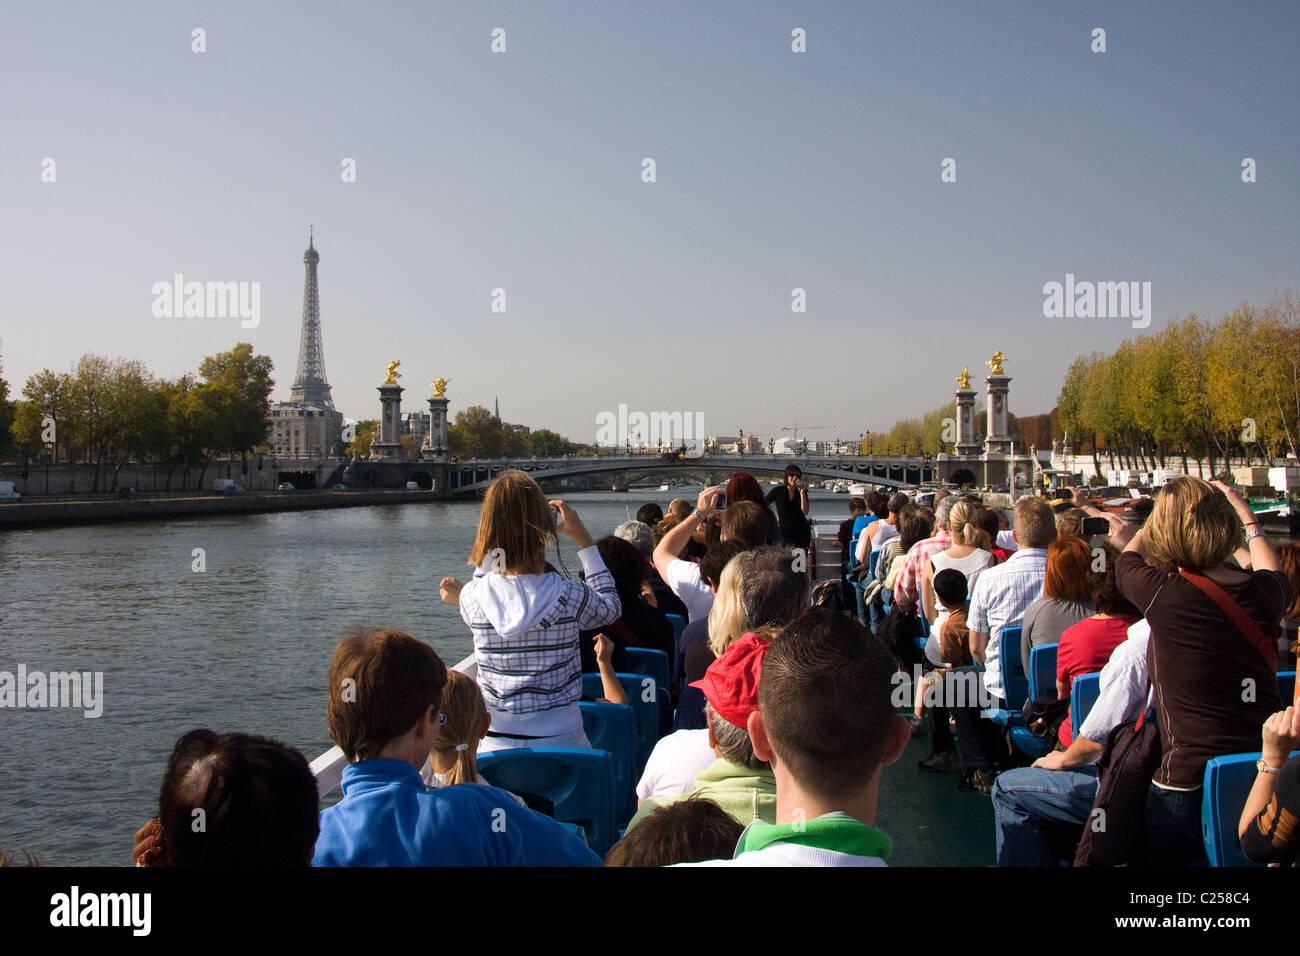 Boat cruise on River Seine, Paris - Stock Image